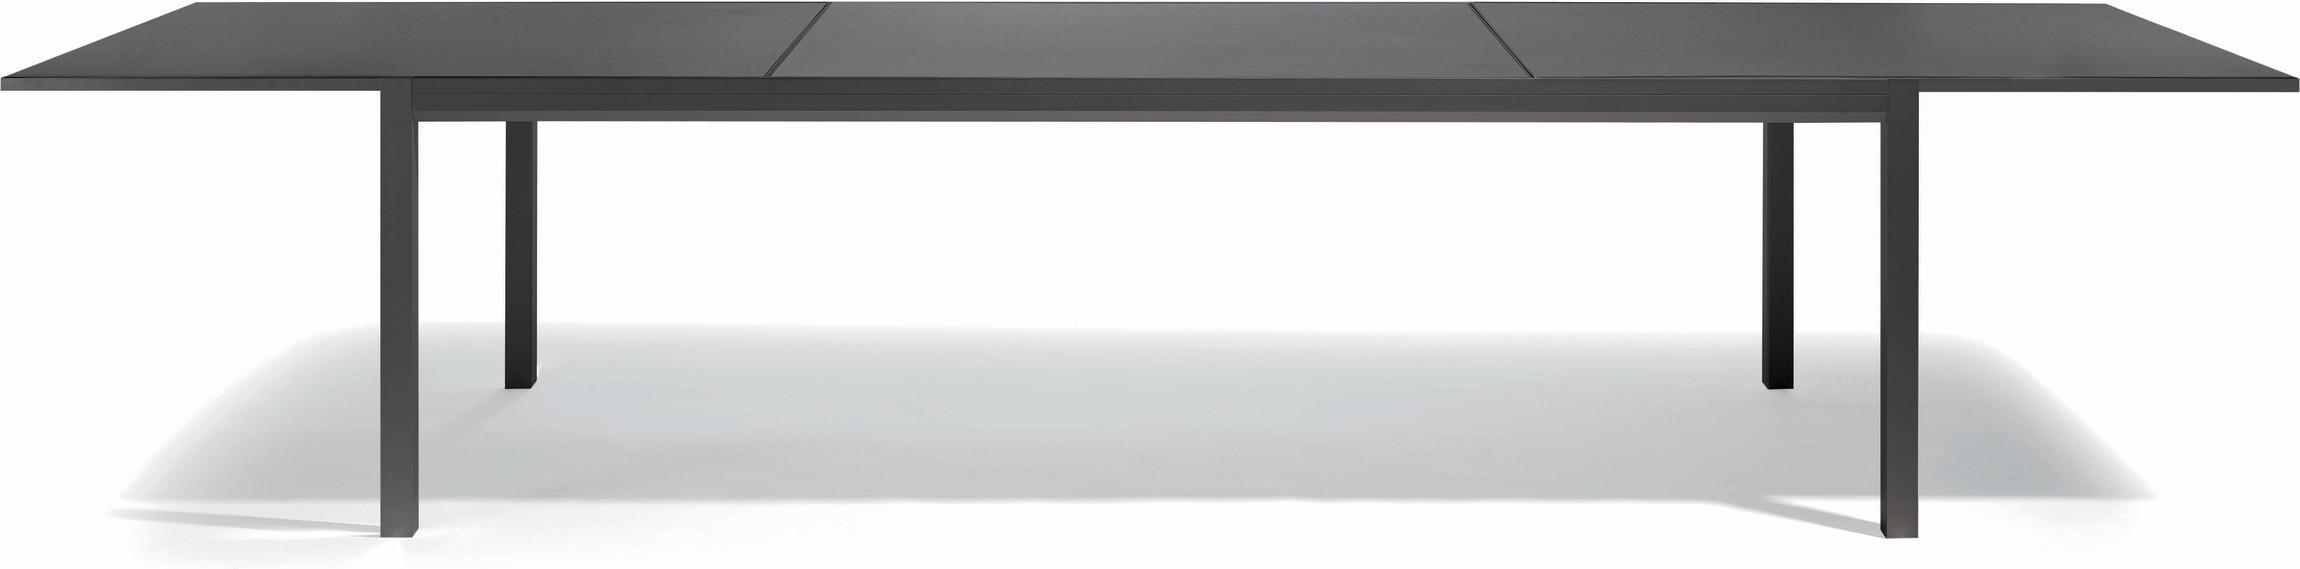 Eettafel Luna - lava - GLB 360